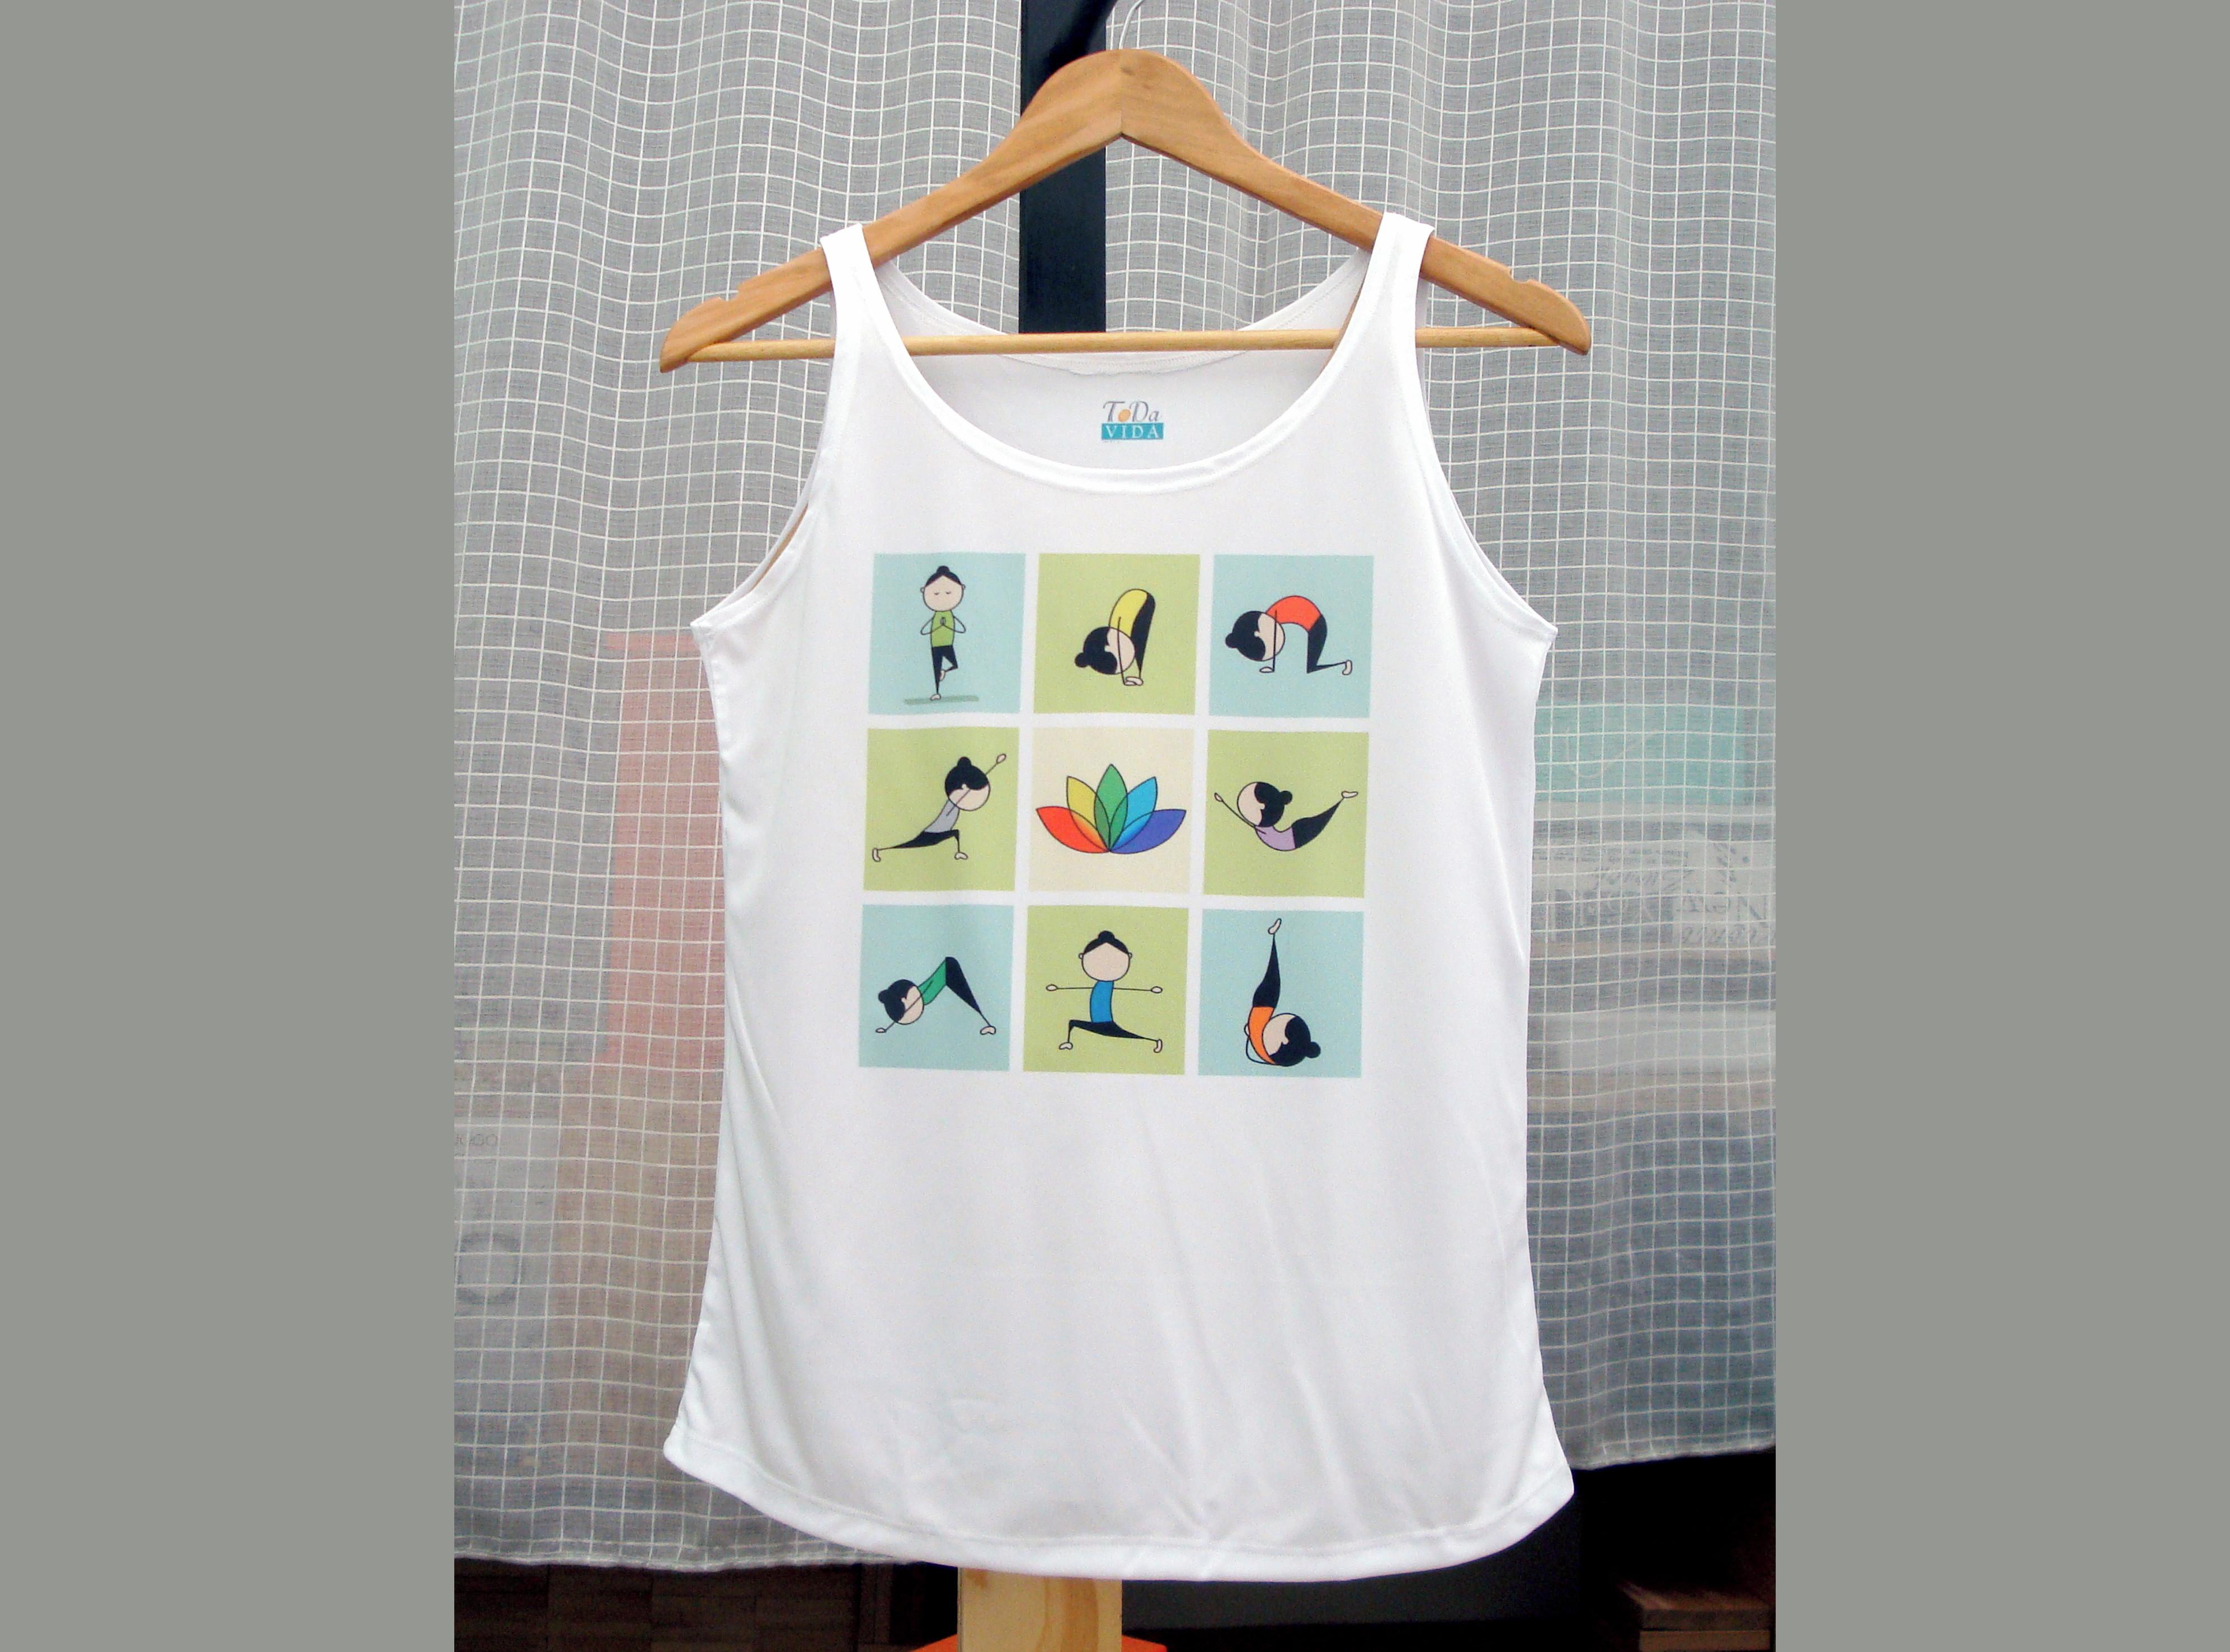 69d0e1c24a2b44 Camiseta sem Estampa Malha Dry Fit Masculina | Elo7